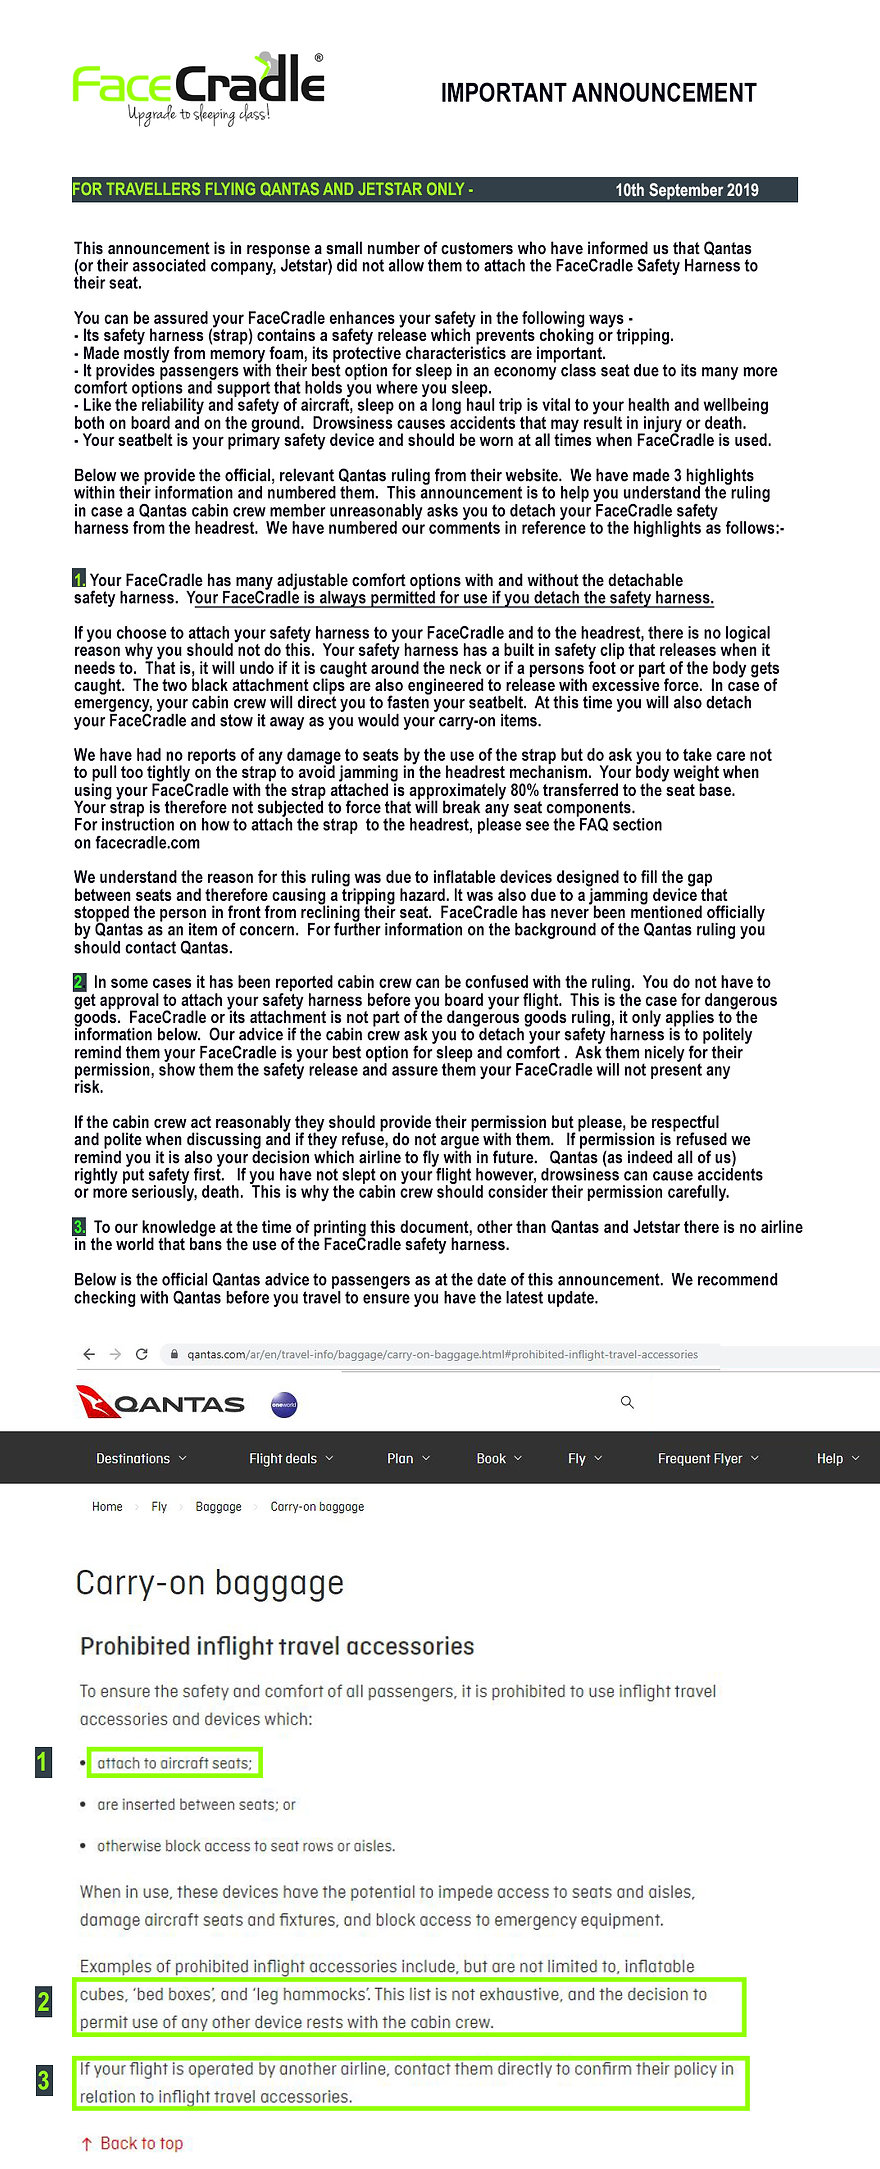 Qantas Website Information - Prohibited